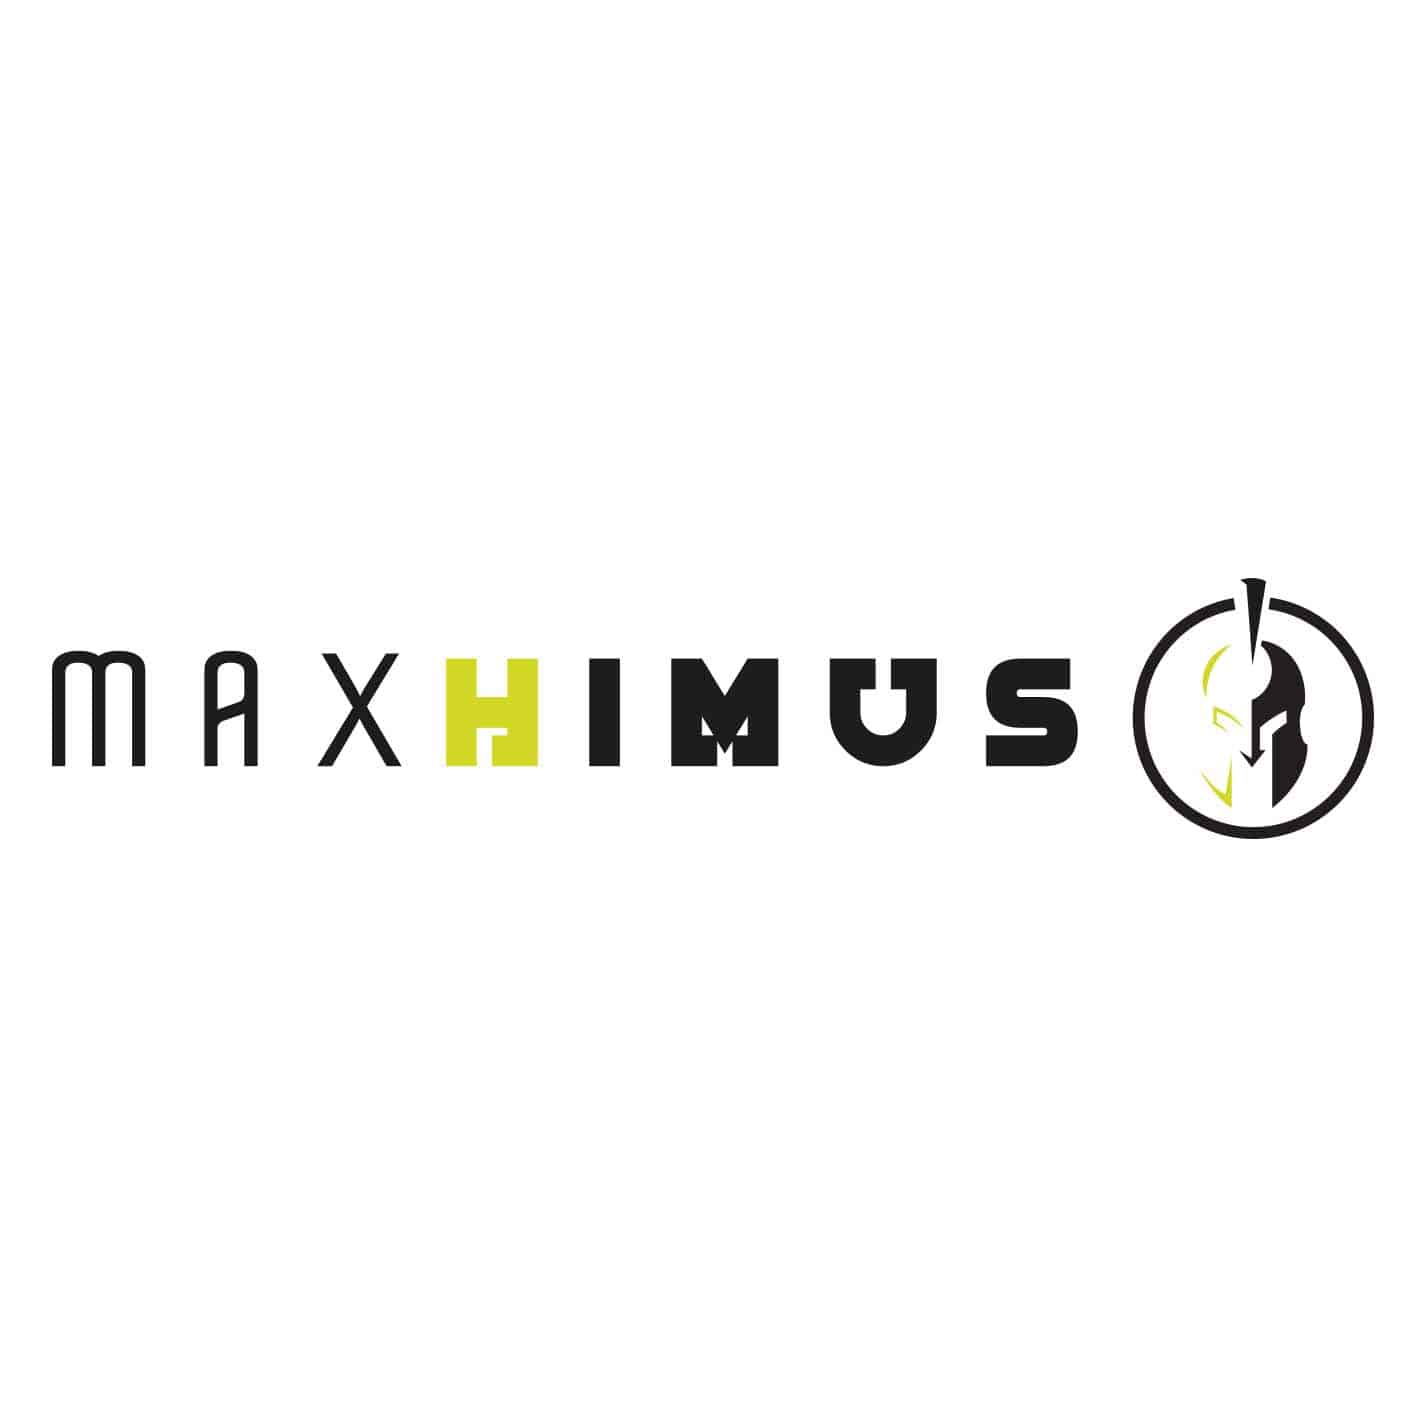 logo-maxhimus-1964-communication